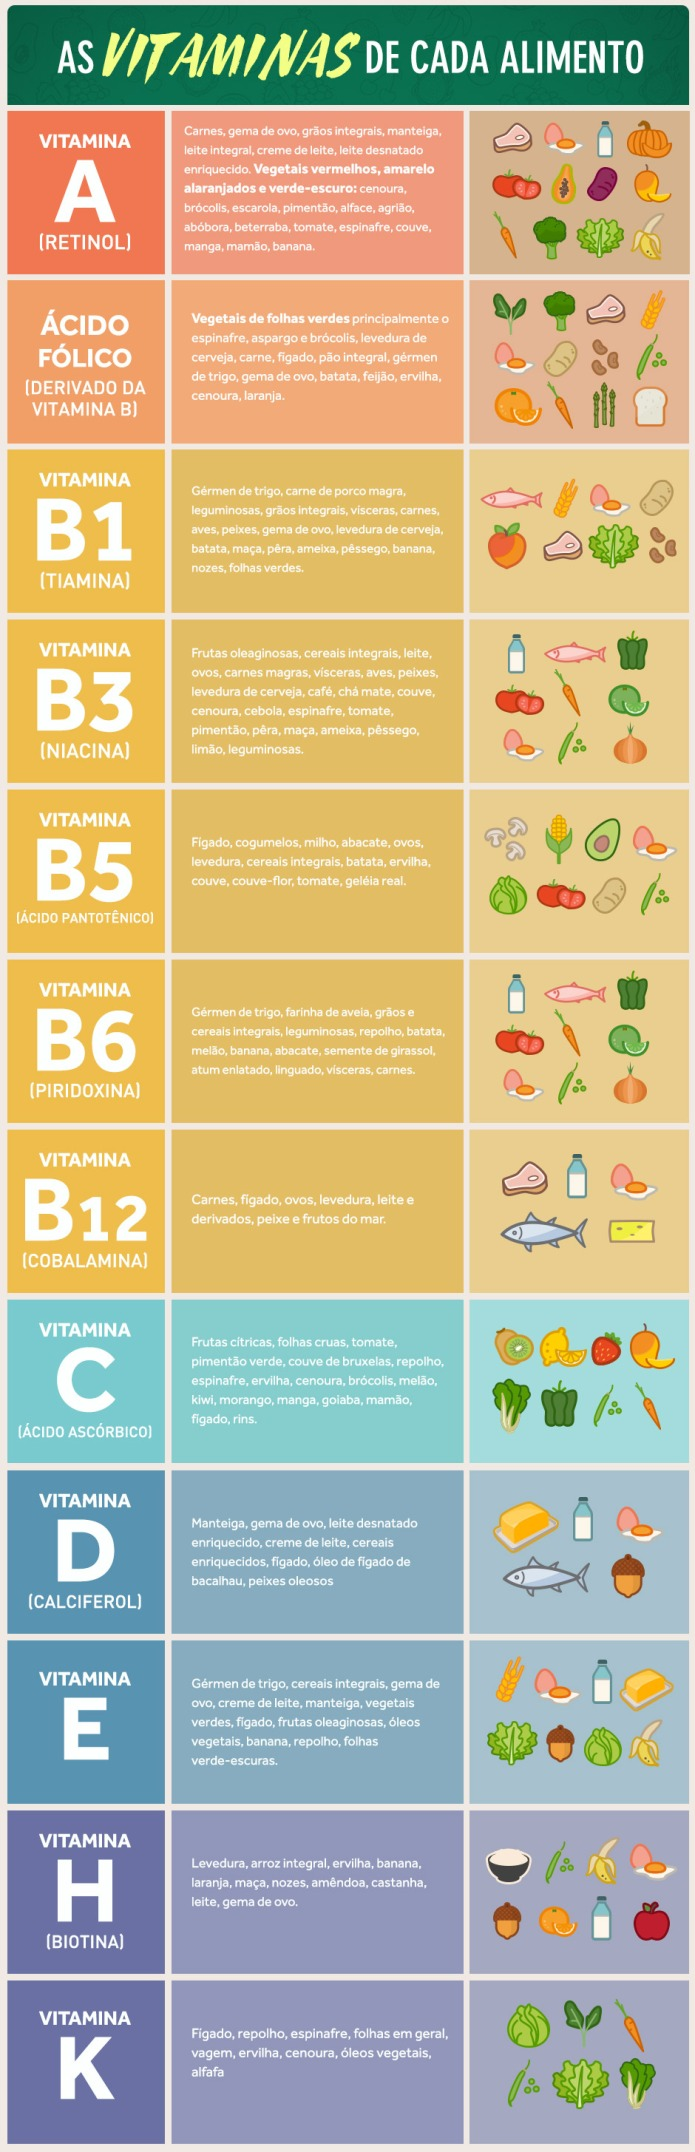 vitaminas2.jpg